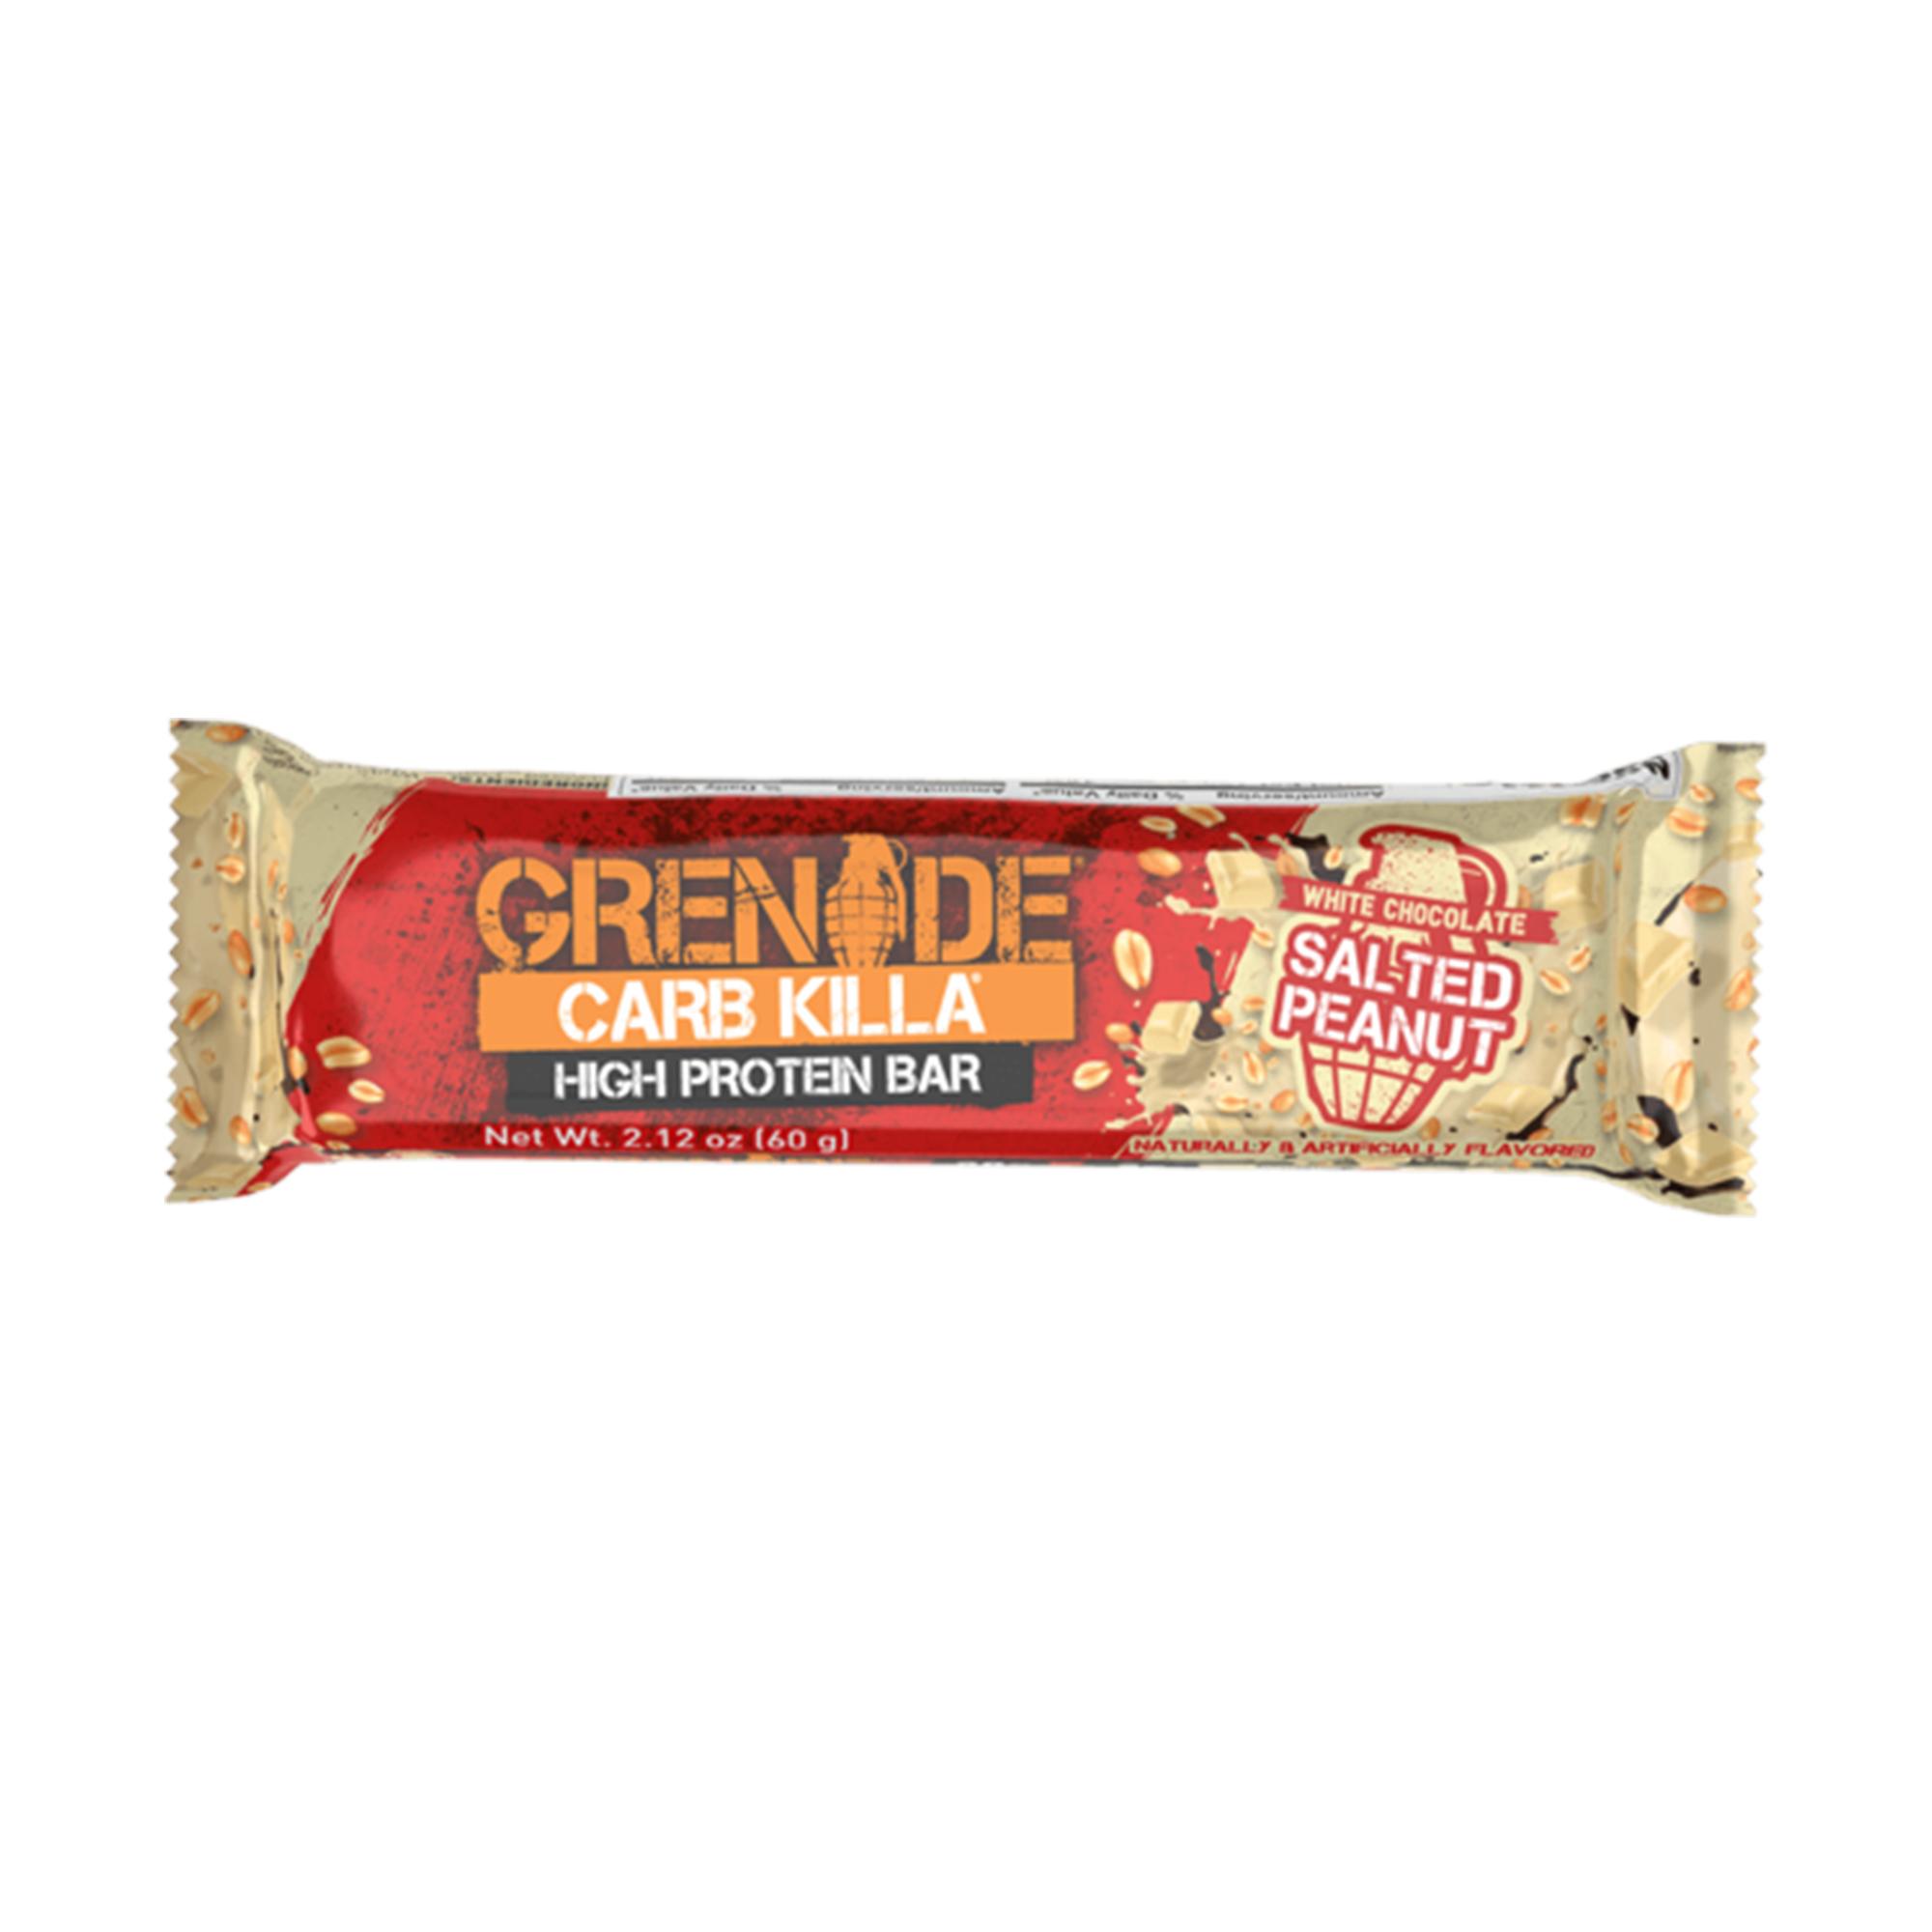 Grenade Carb Killa White Chocolate Salted Peanut 2